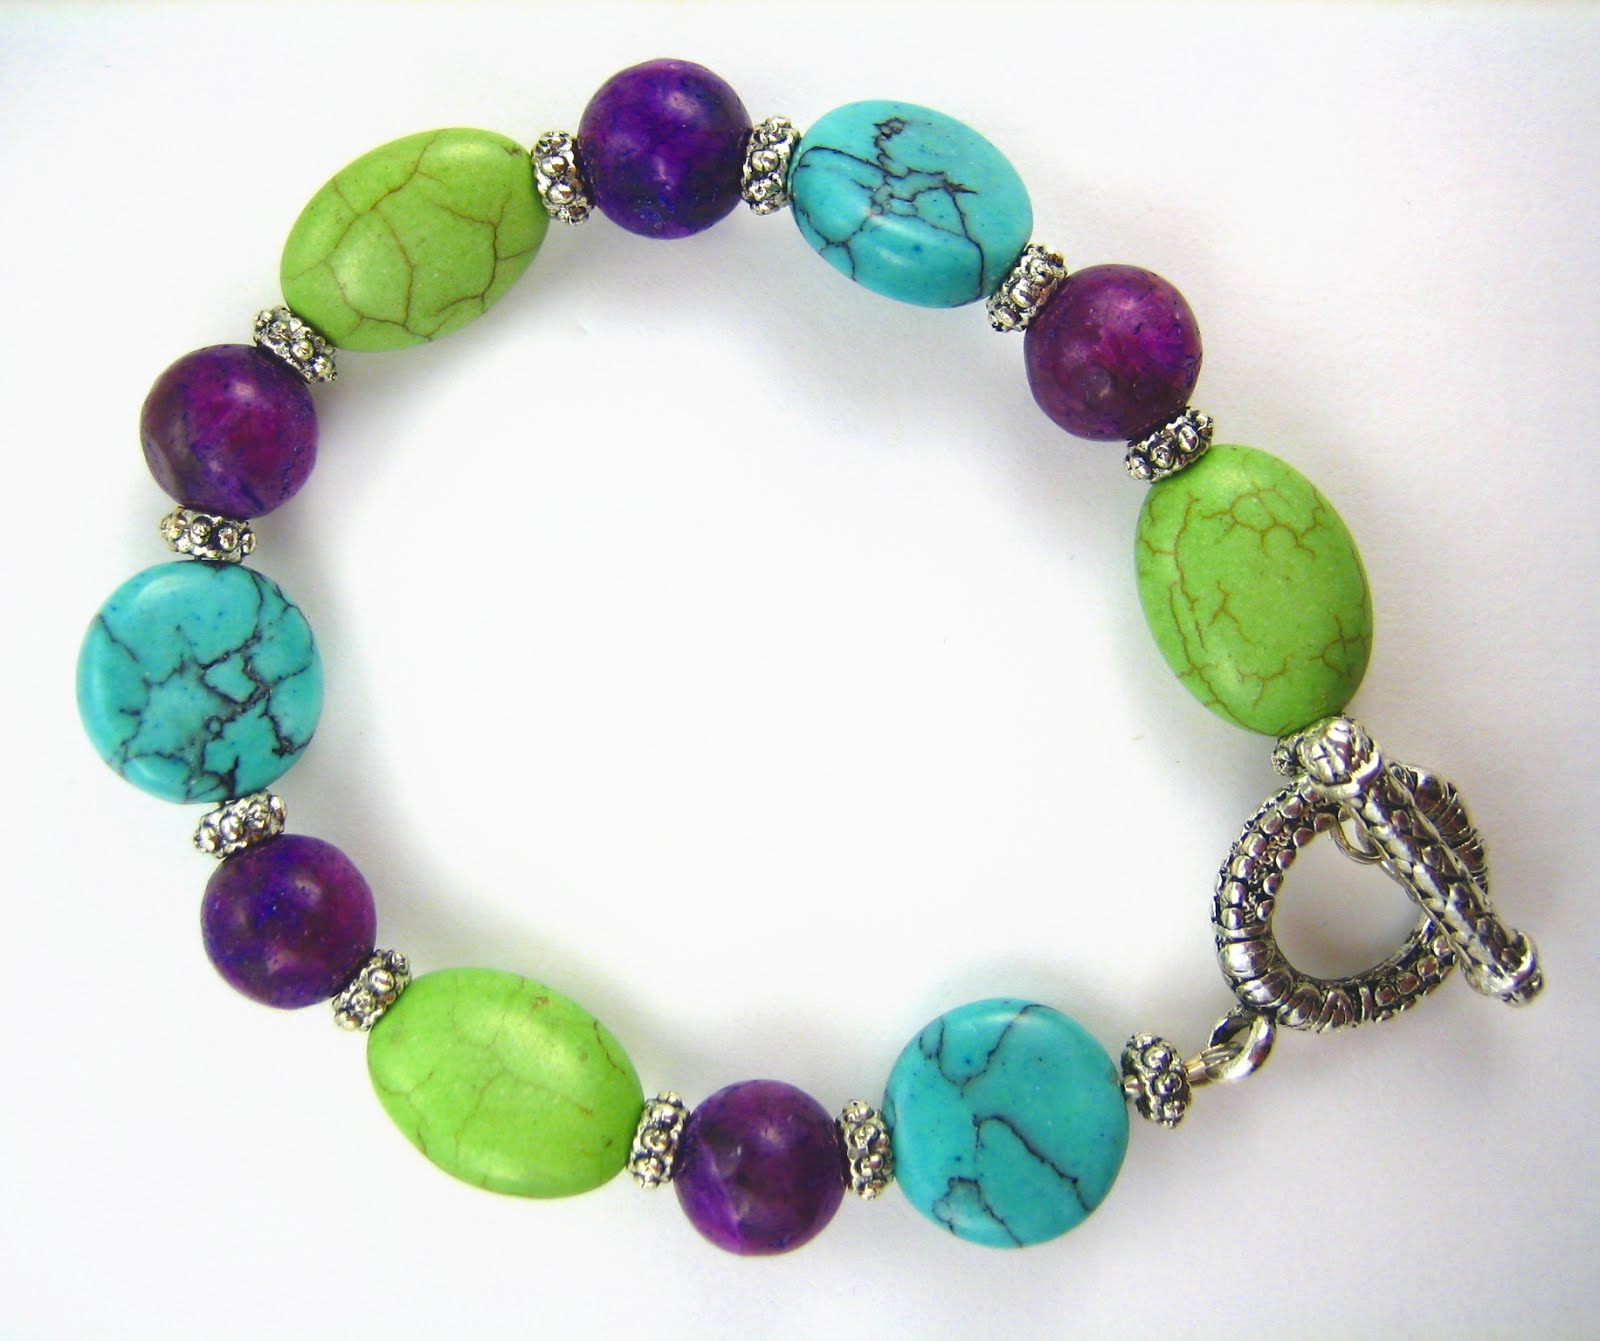 jewelry design shop large bead purple turquoise green